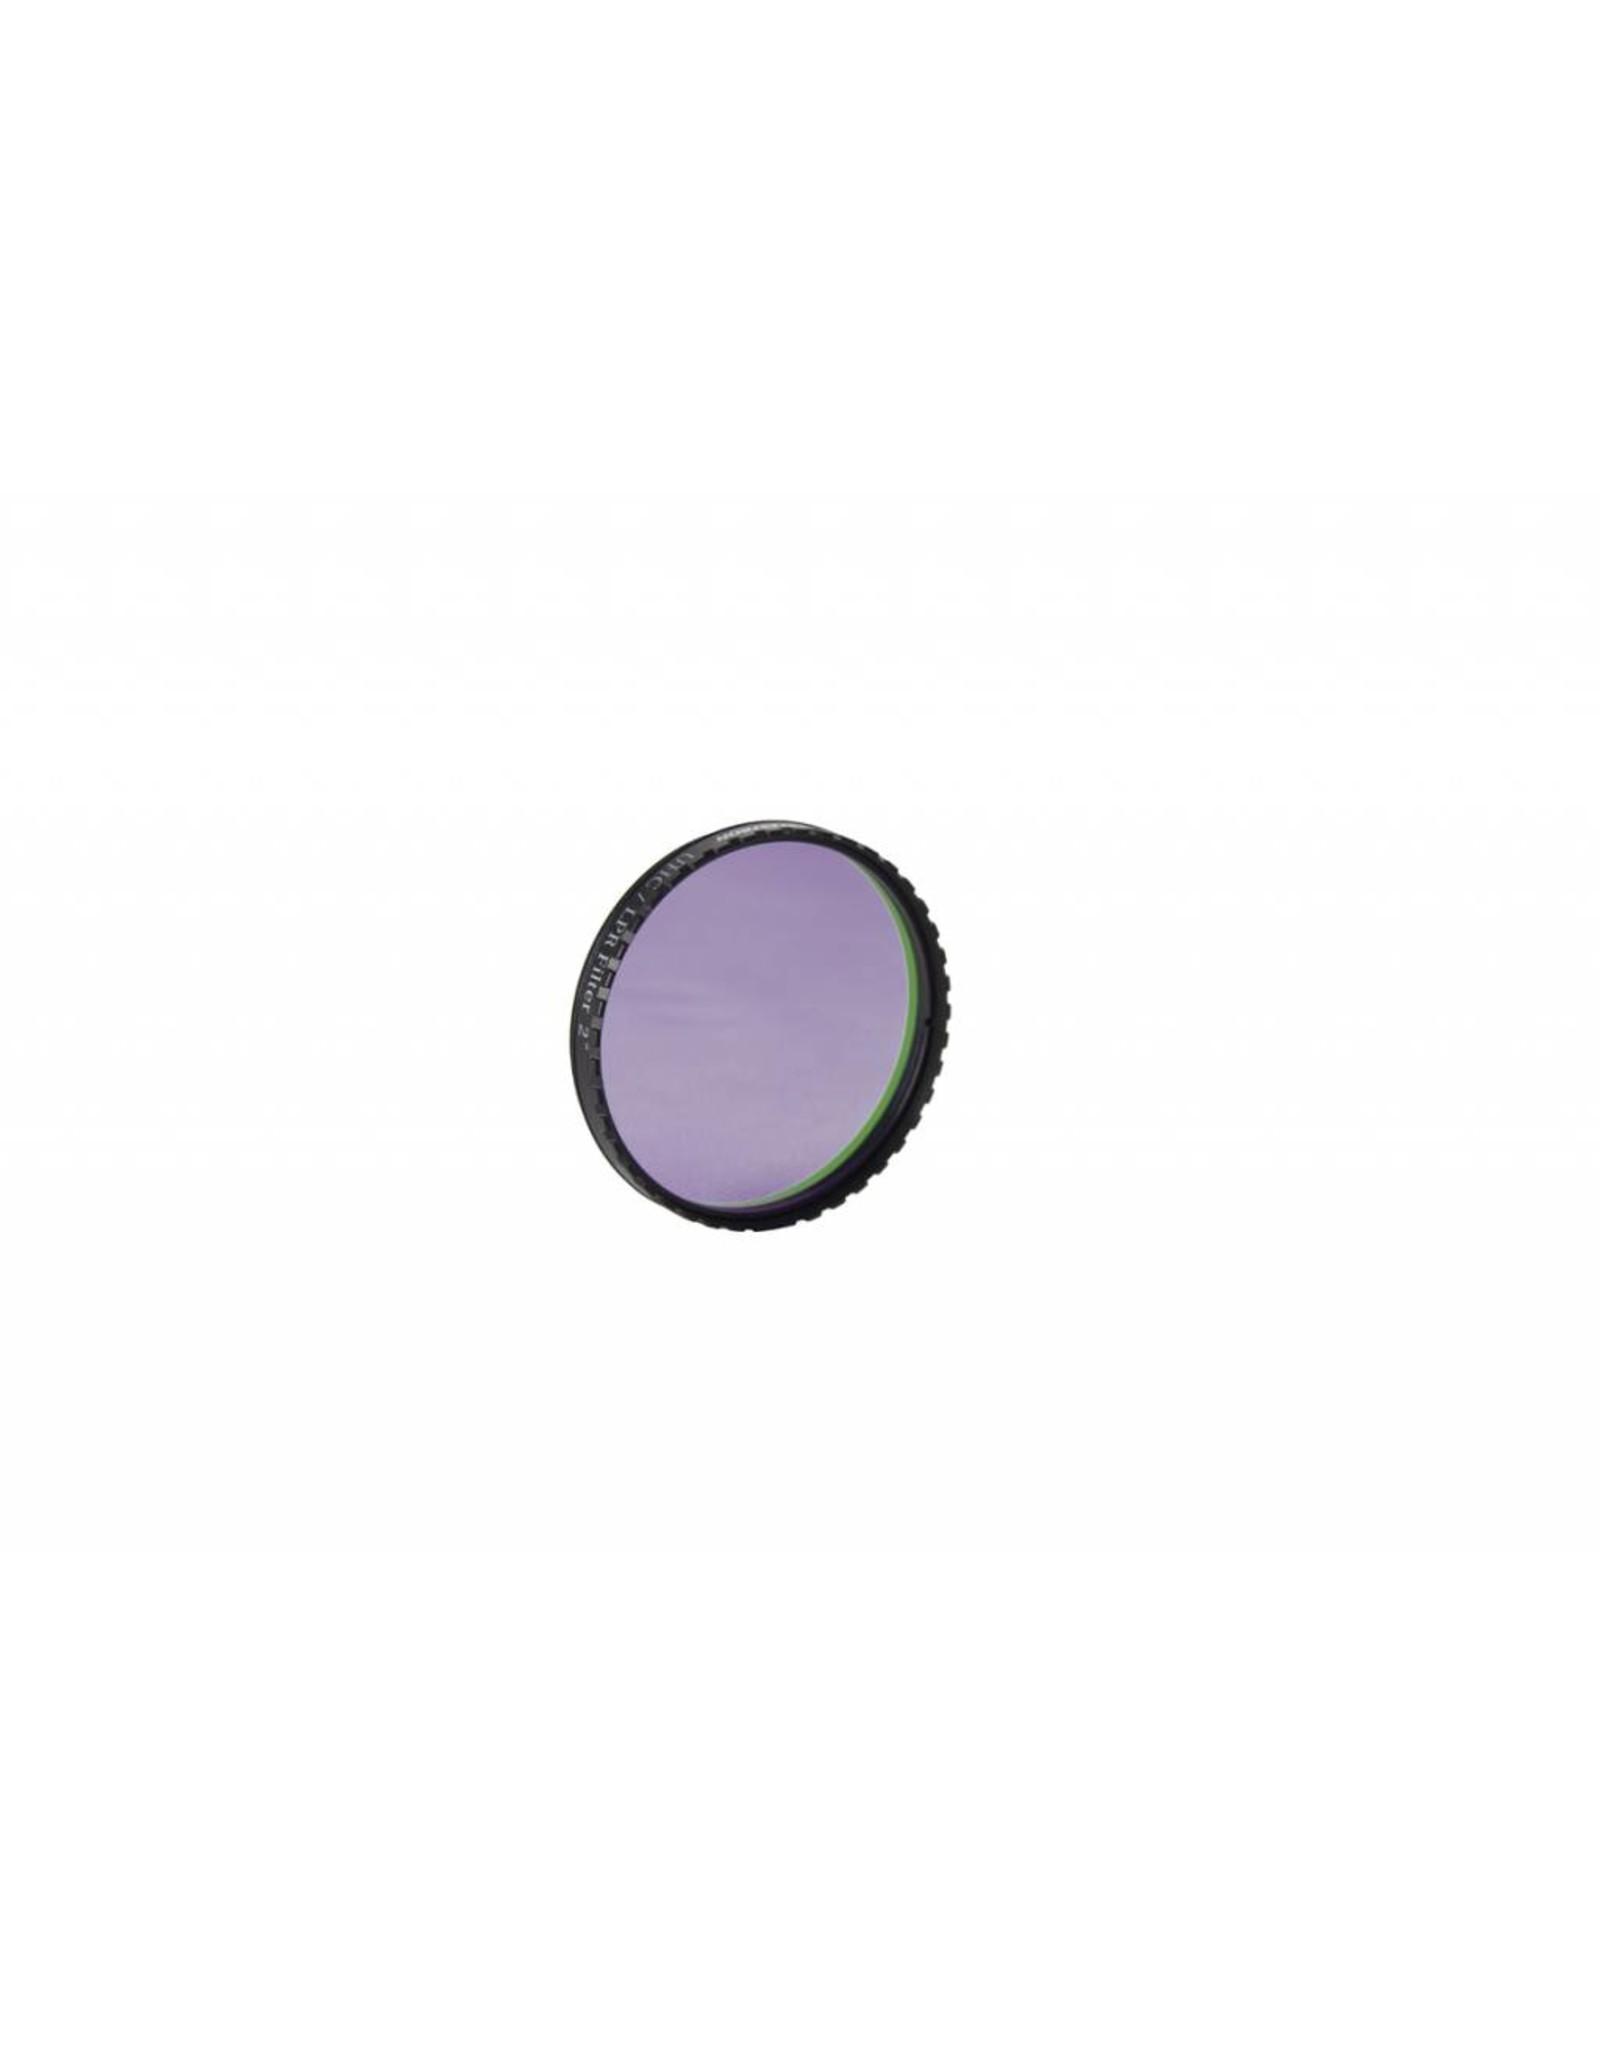 Celestron Celestron UHC/LPR Filter - 2 in